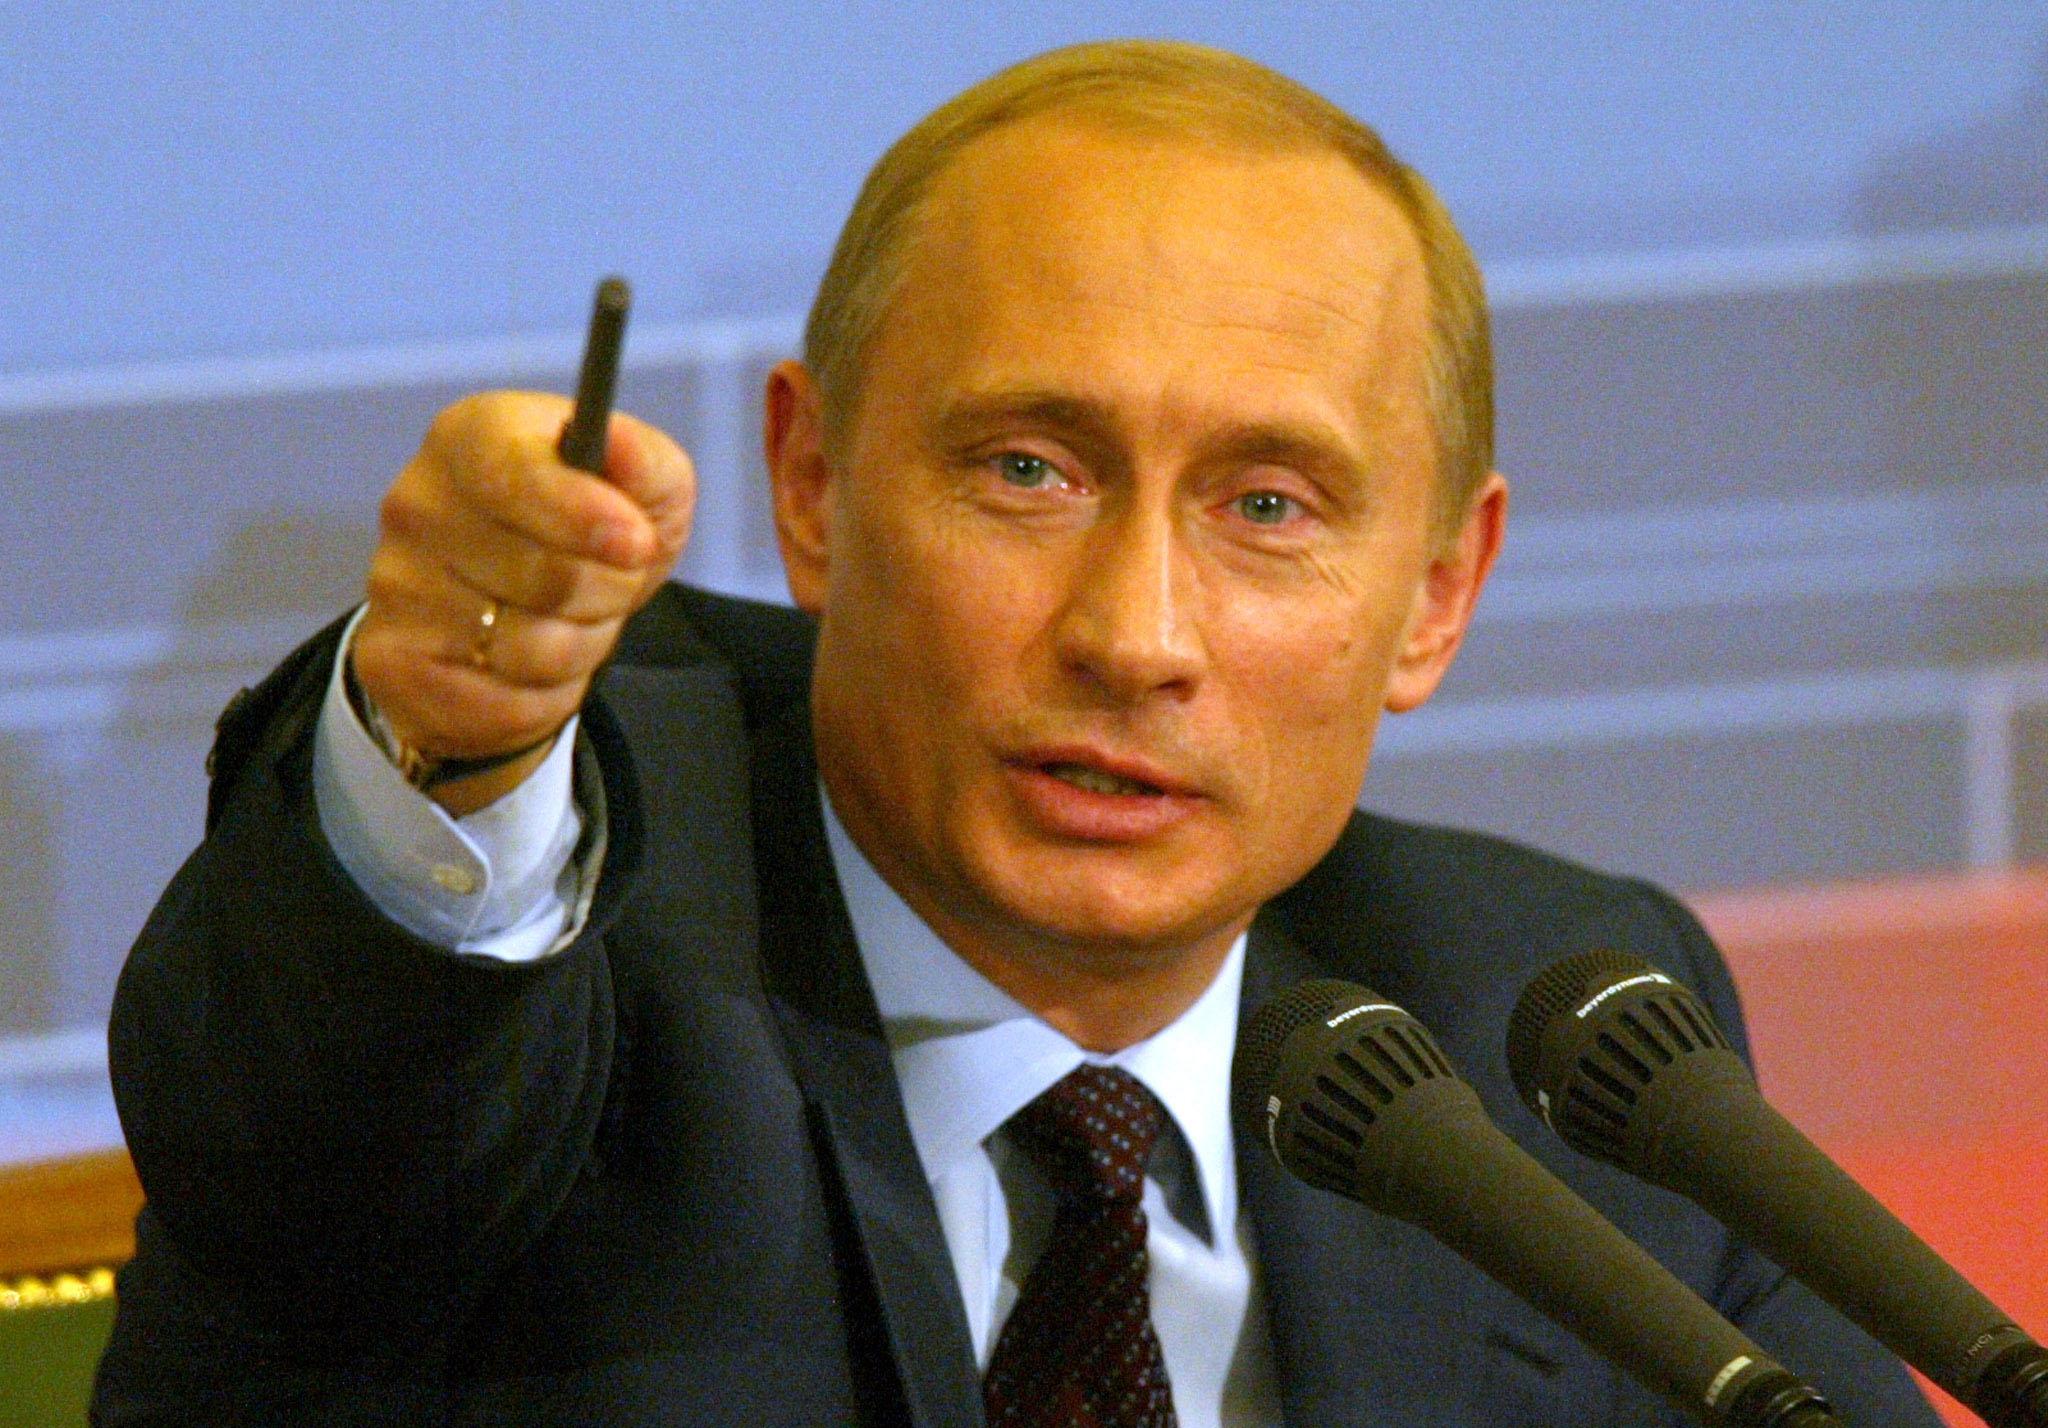 President Vladimir Putin (Source: Wikimedia Commons)